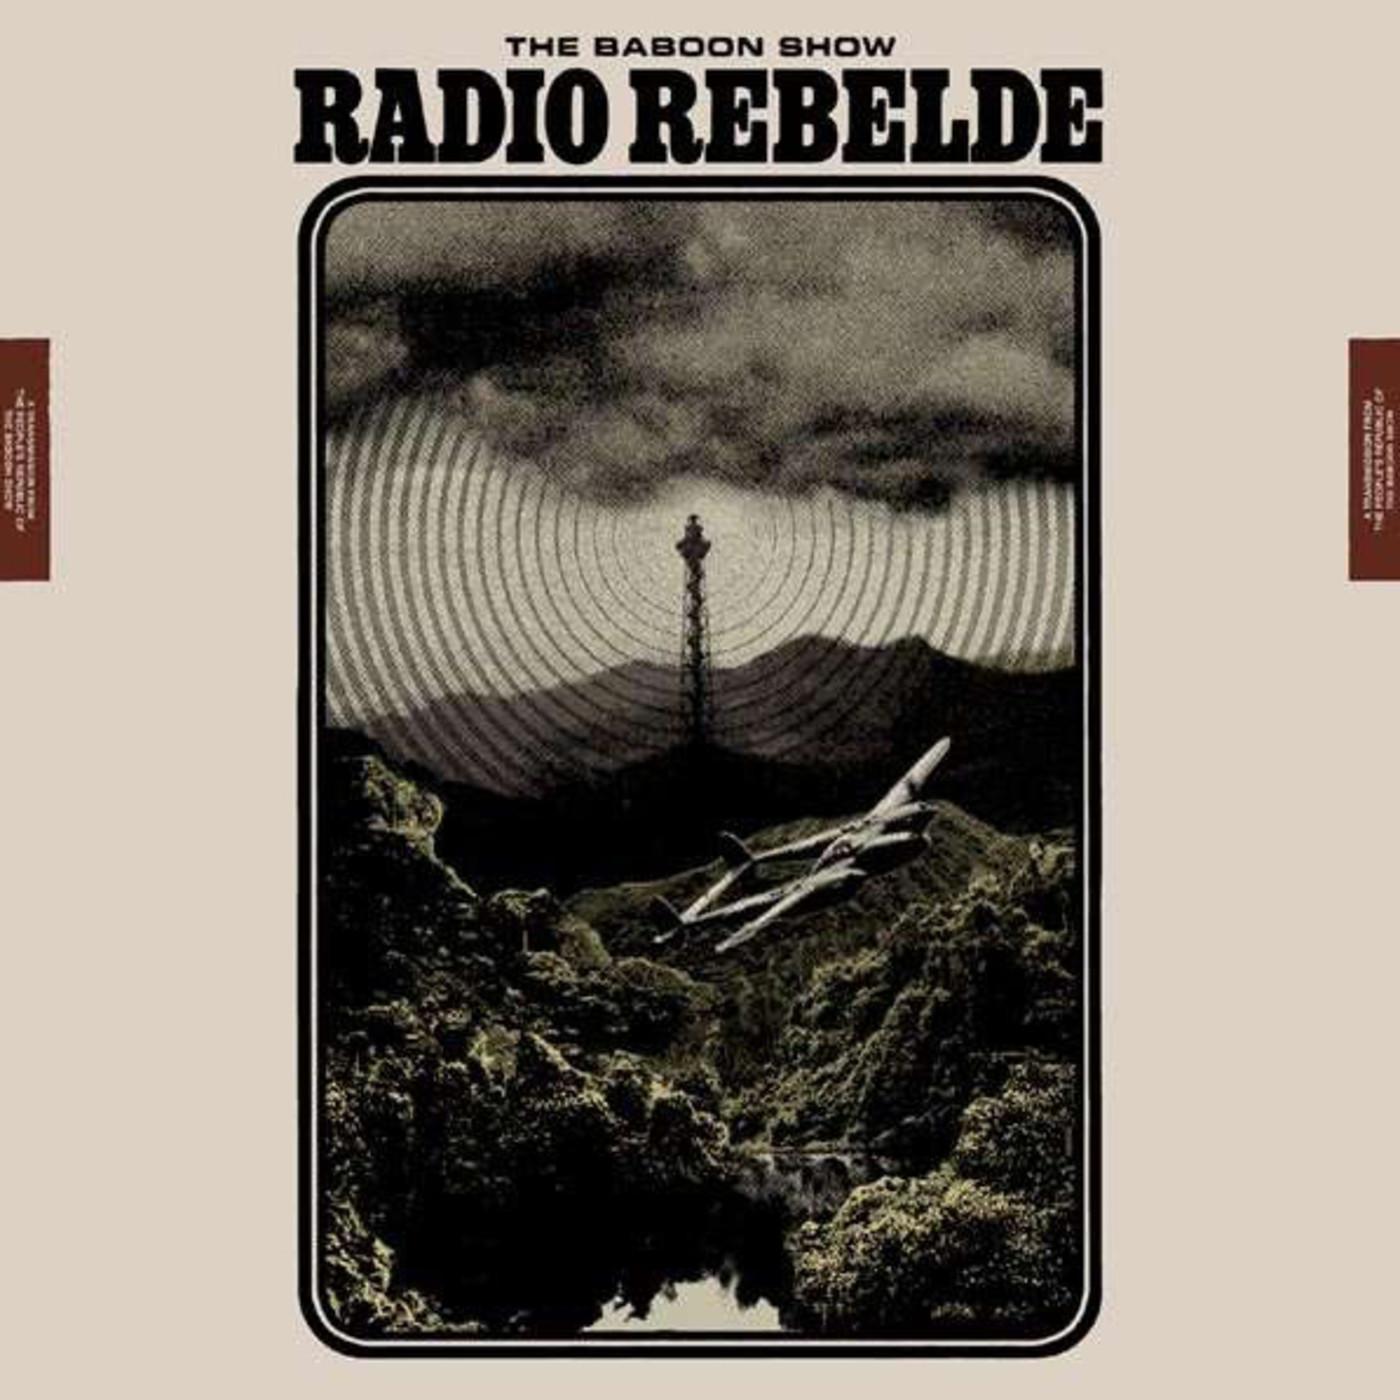 Radio lovers V (14/02/2020)